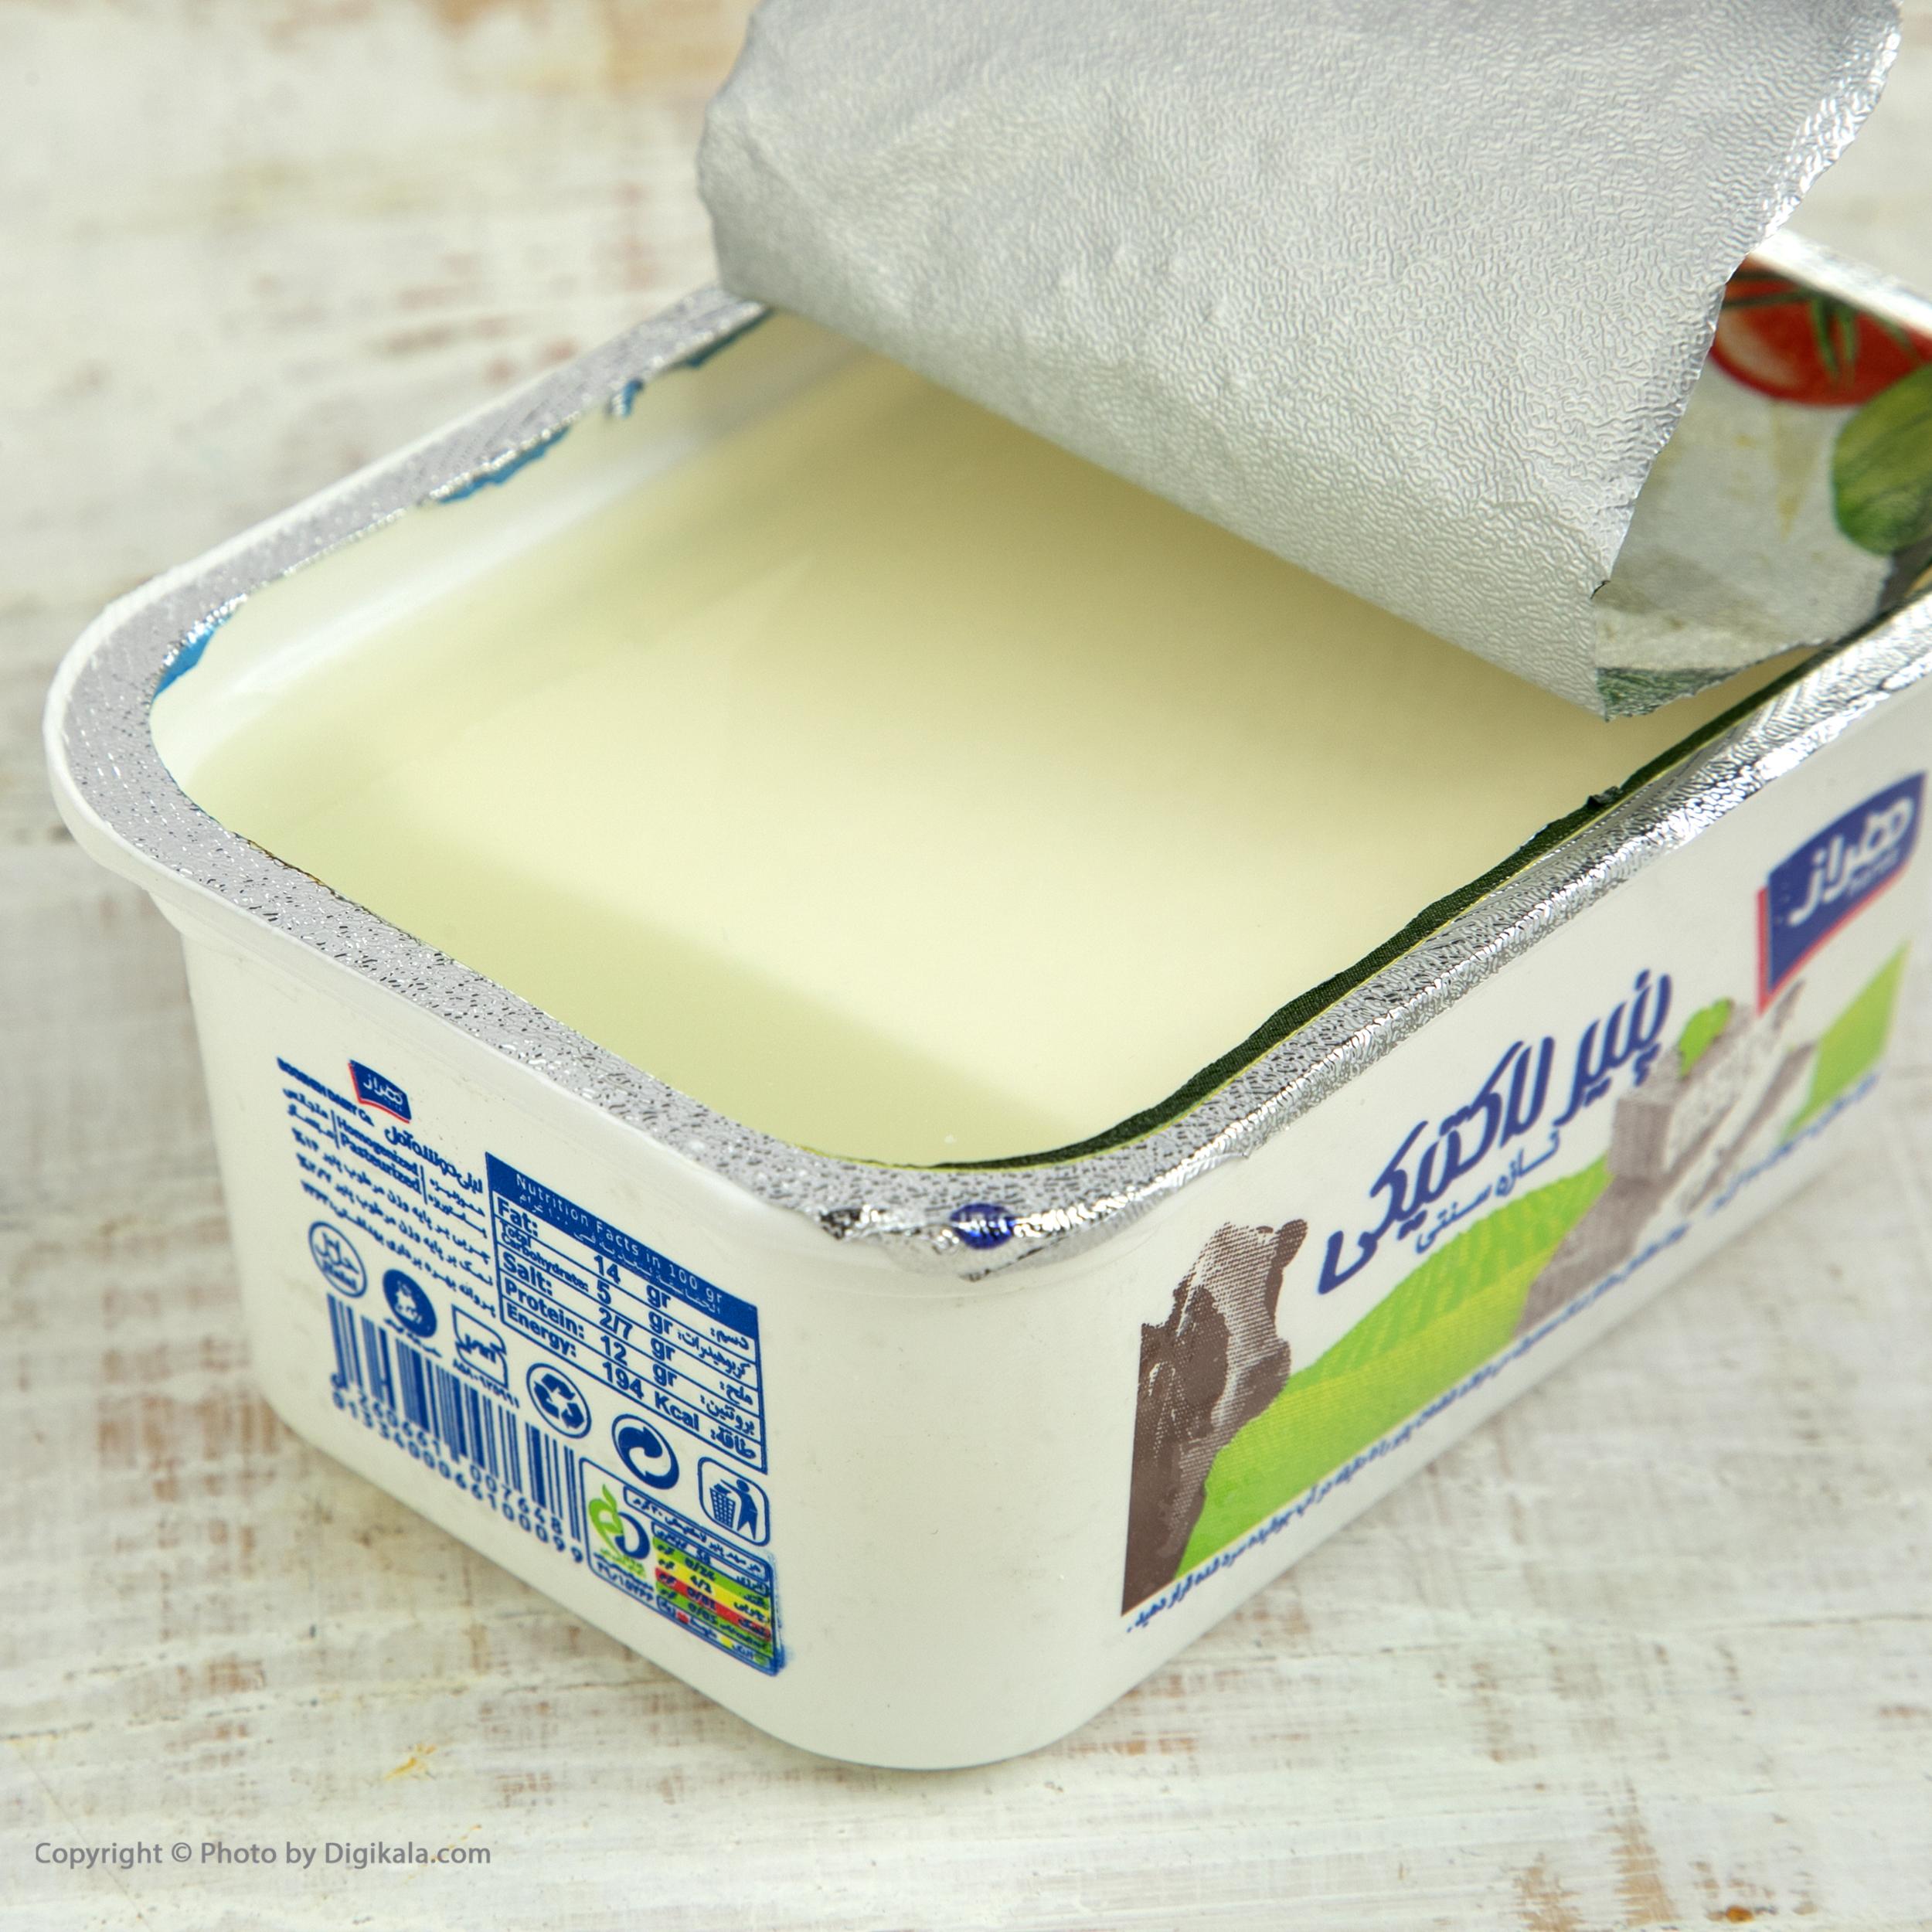 پنیر لاکتیکی هراز وزن 270 گرم main 1 8